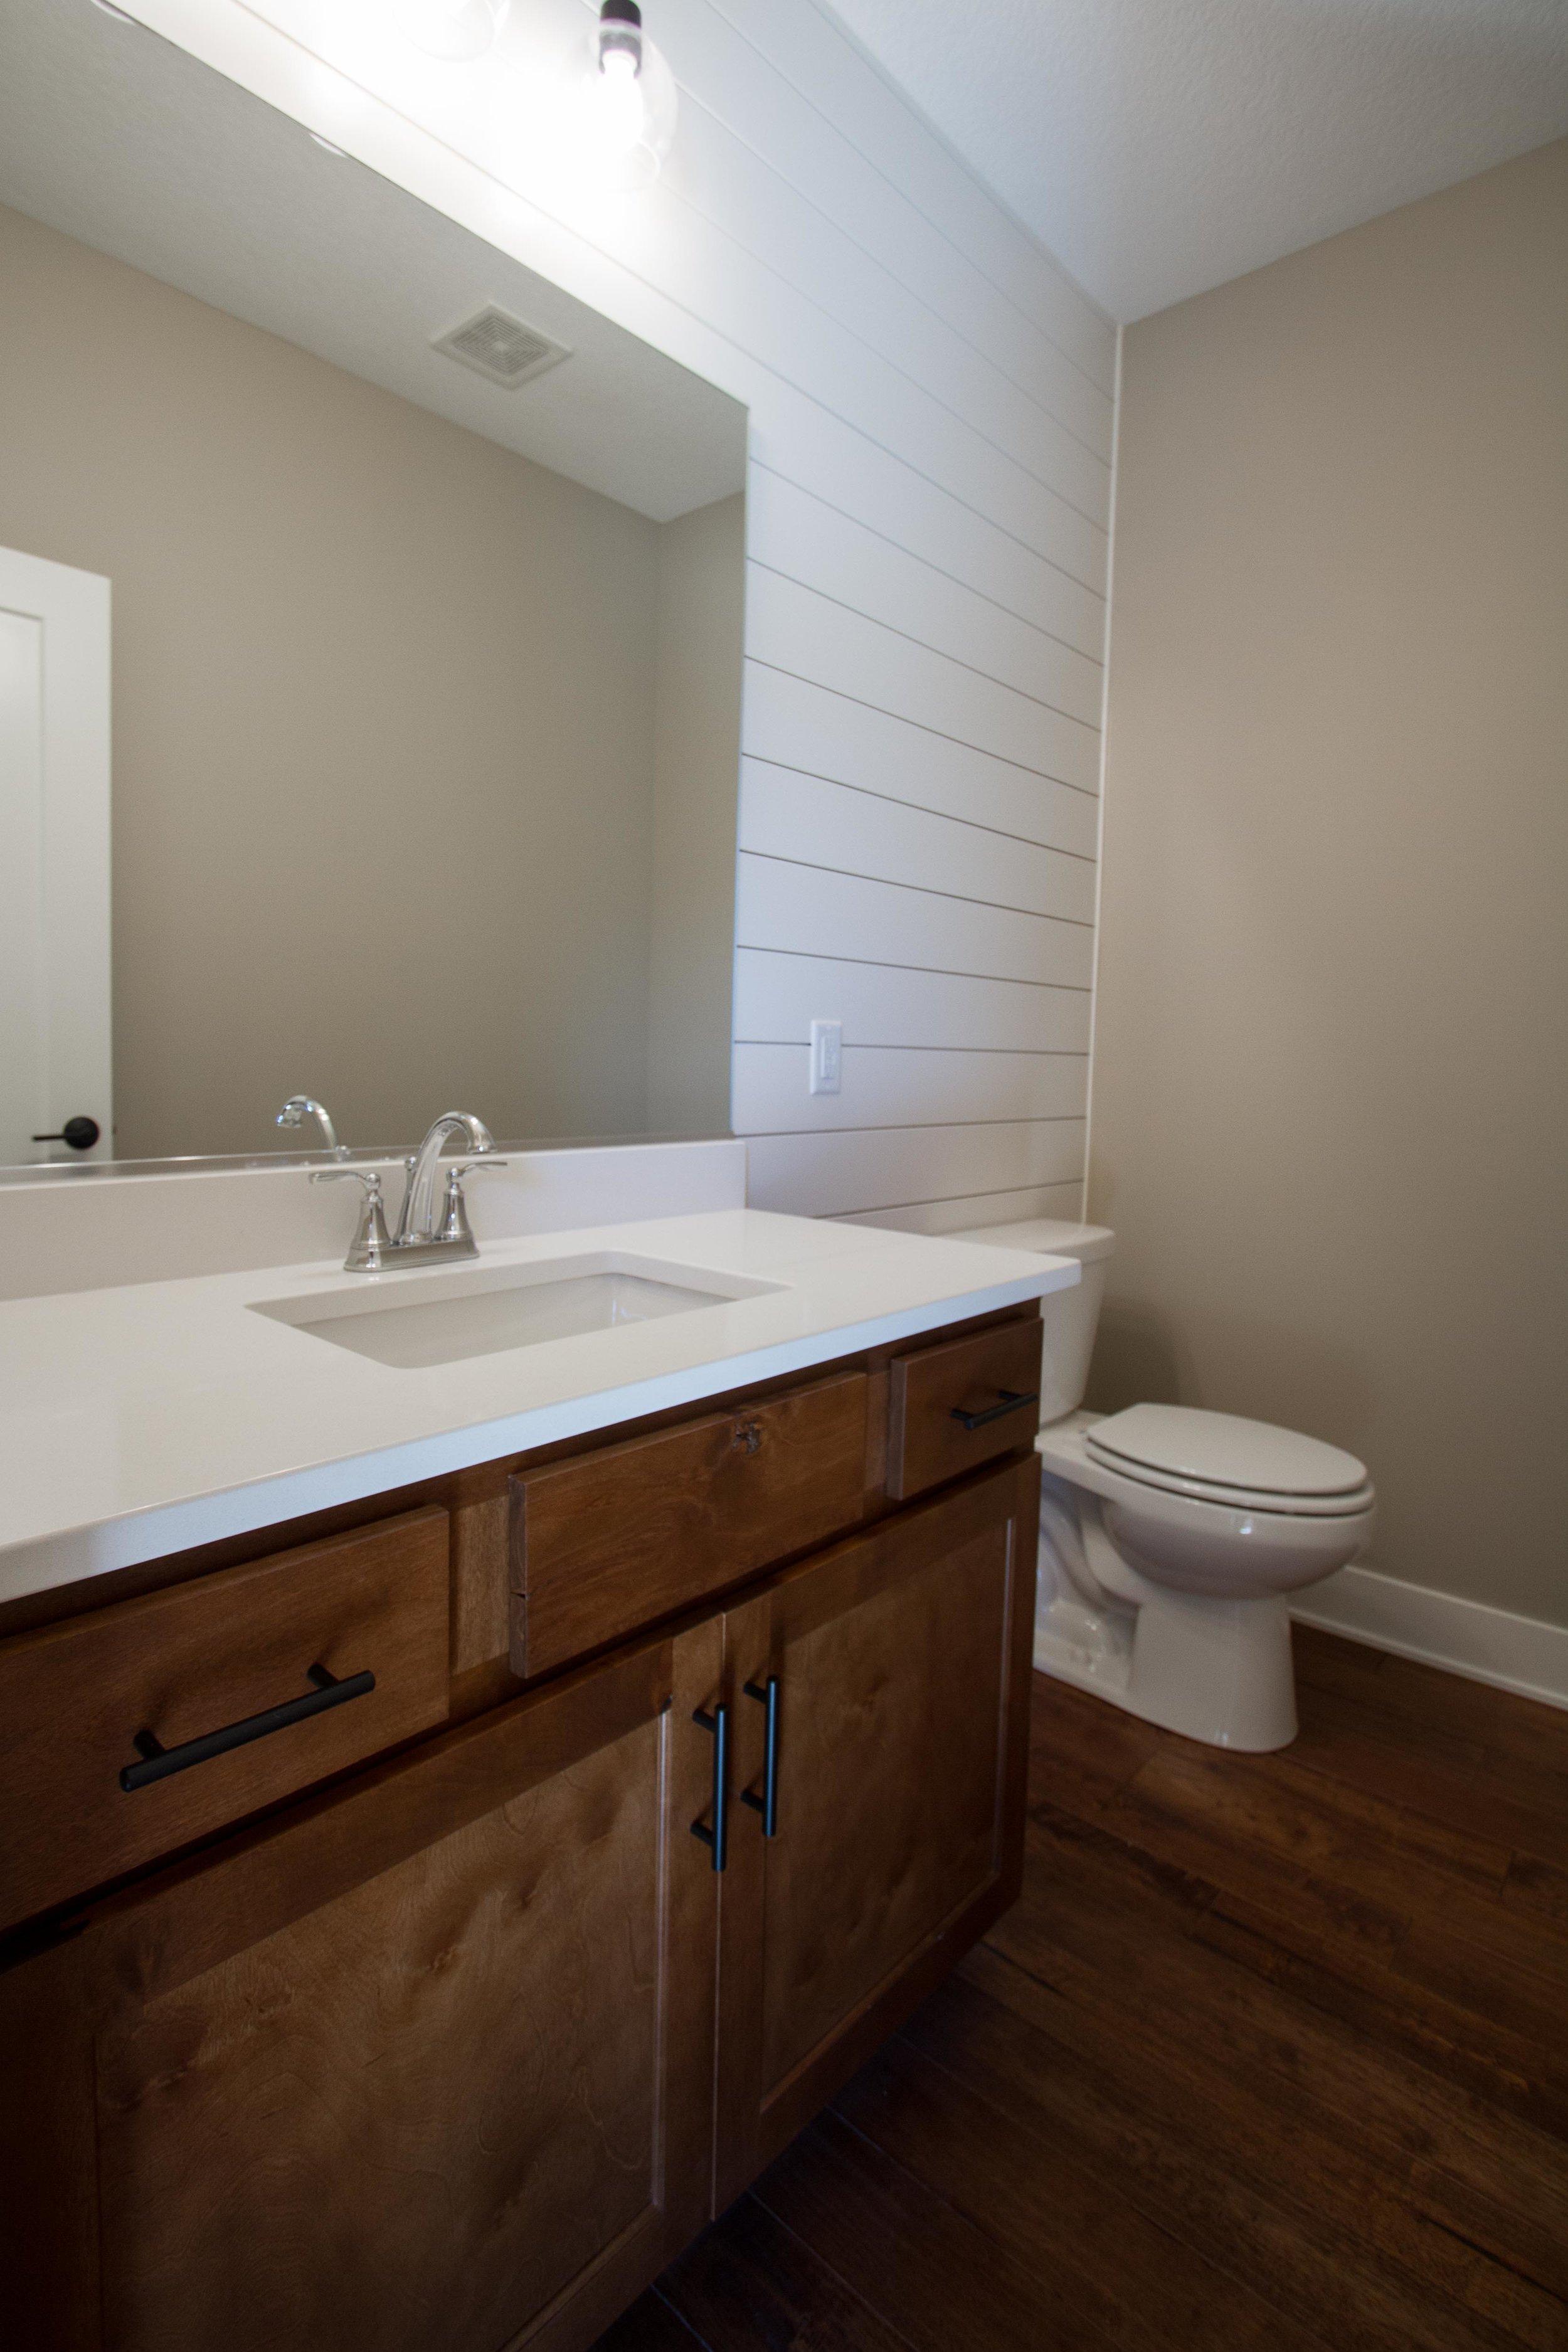 Next_Step_Homes-Bathroom-1.jpg